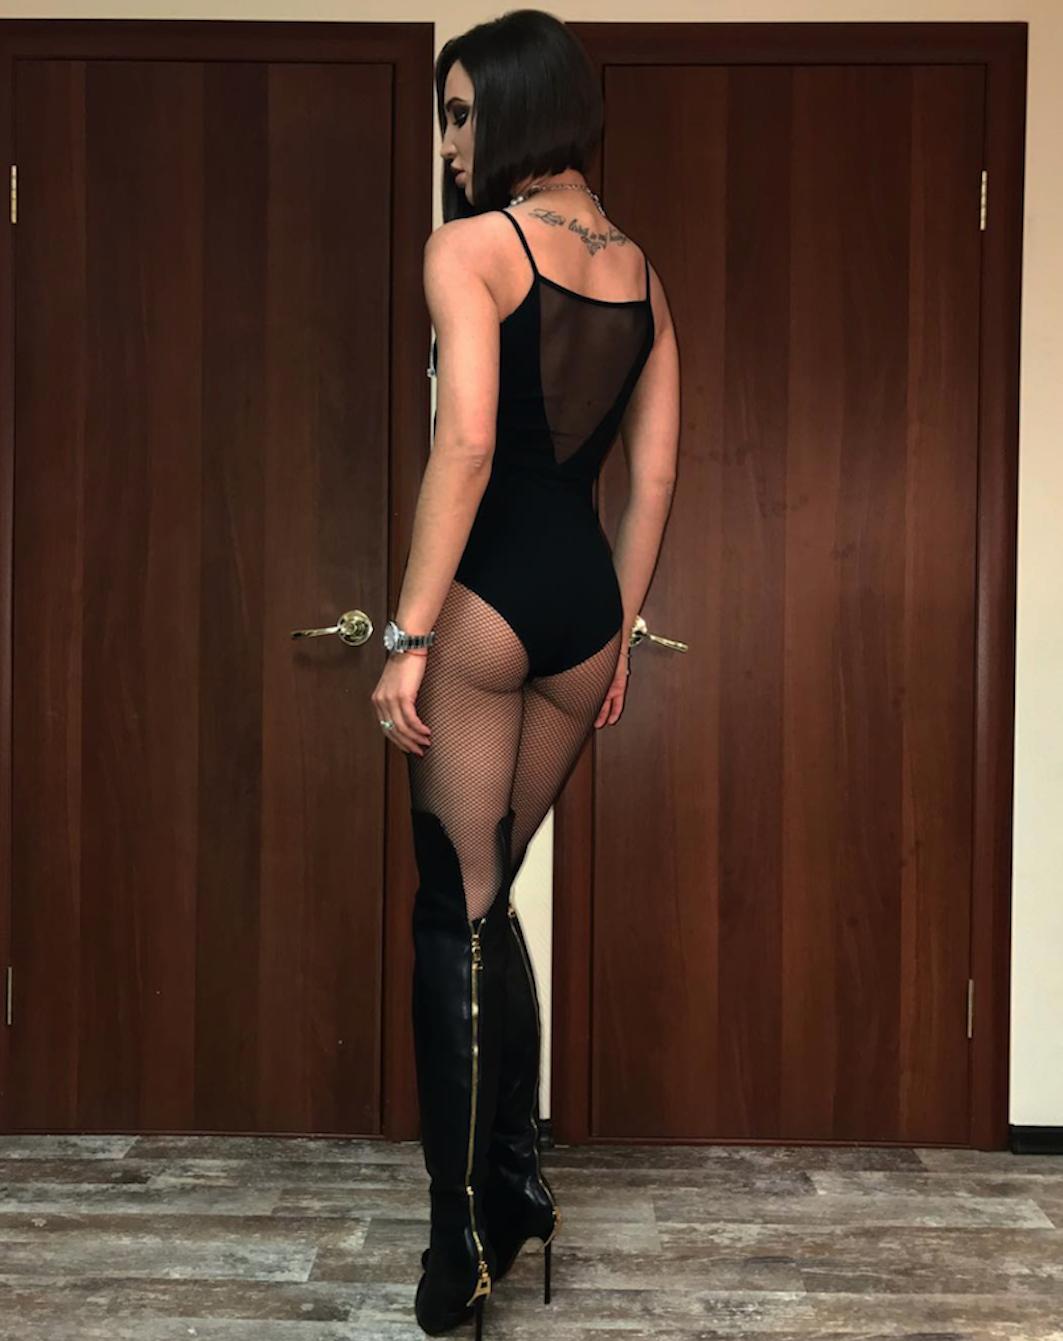 Оля бузова фото секс